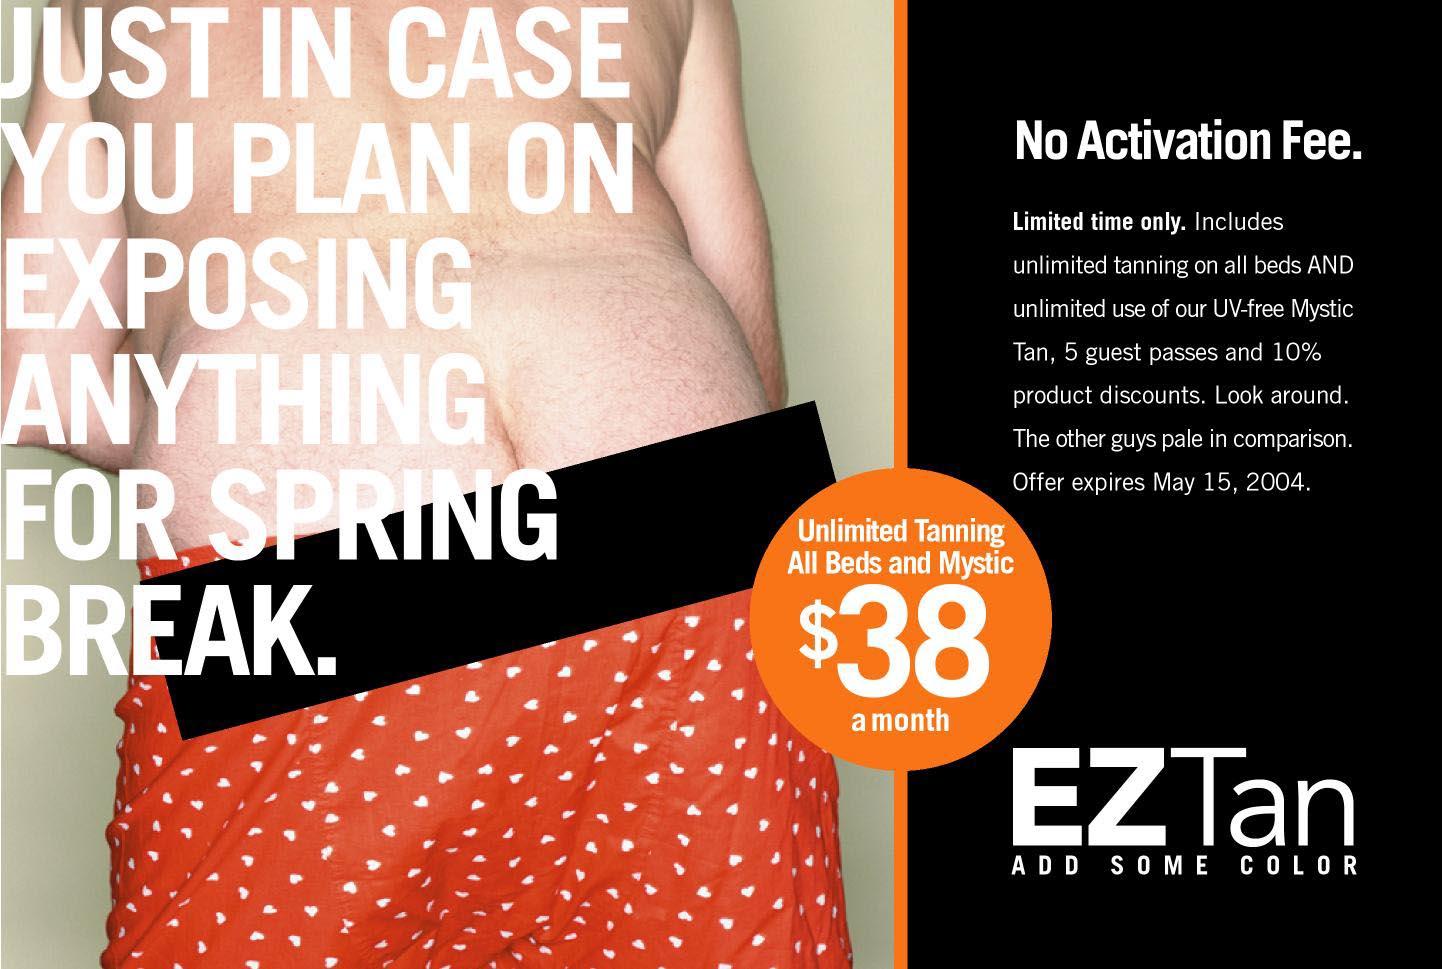 1. EZ Tan Direct Mail